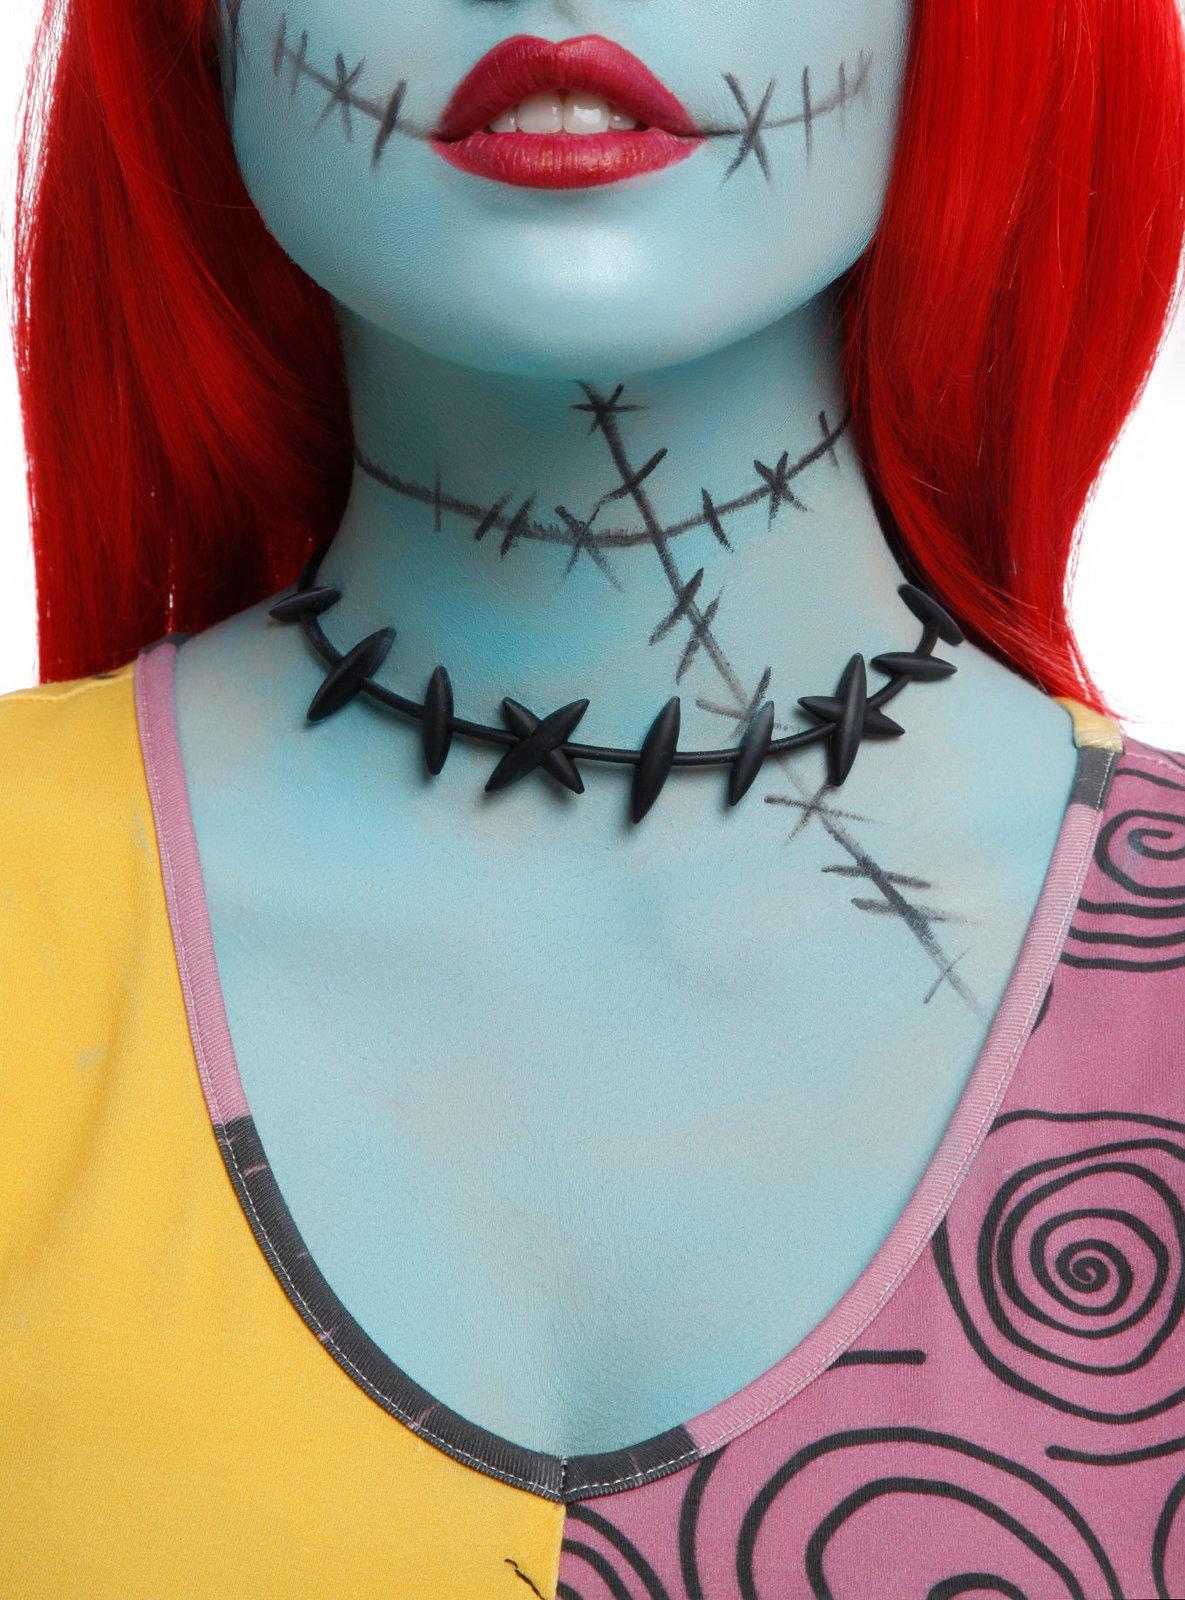 Neon Tuesday: Nightmare Before Christmas - 3 Piece Jewelery Set image